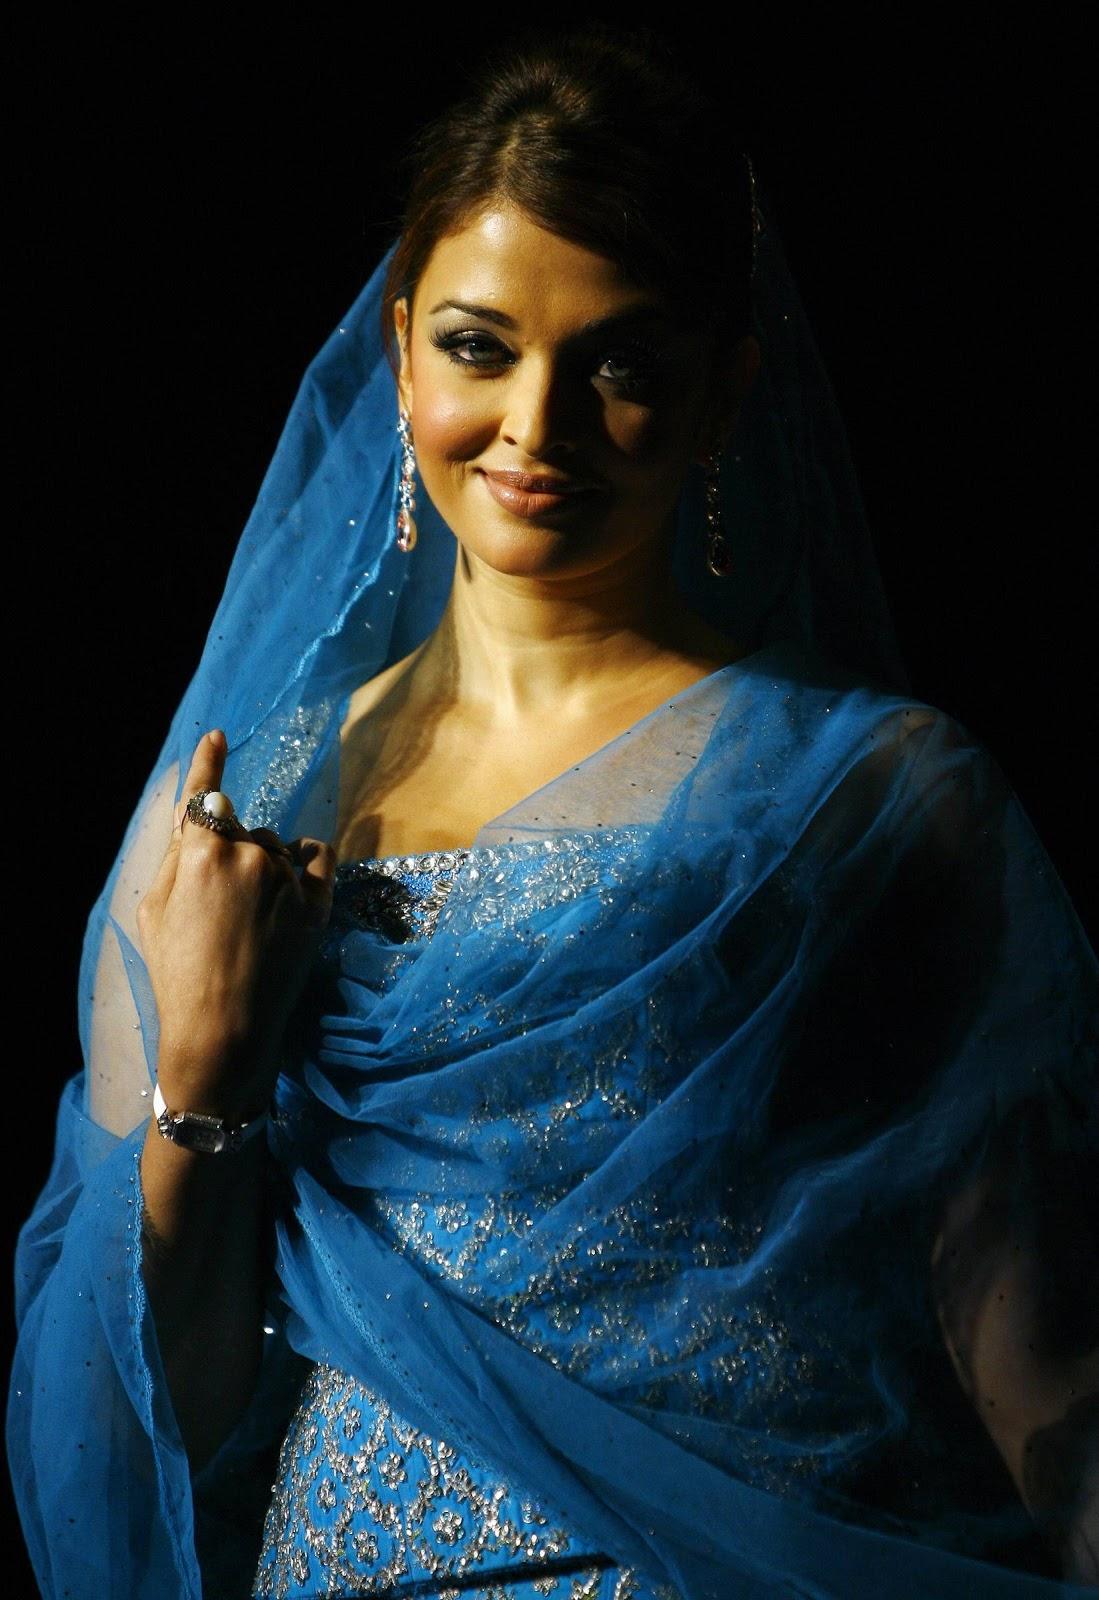 Aishwarya Rai - Hot N Sexy Hq Pics - Paperblog-1744